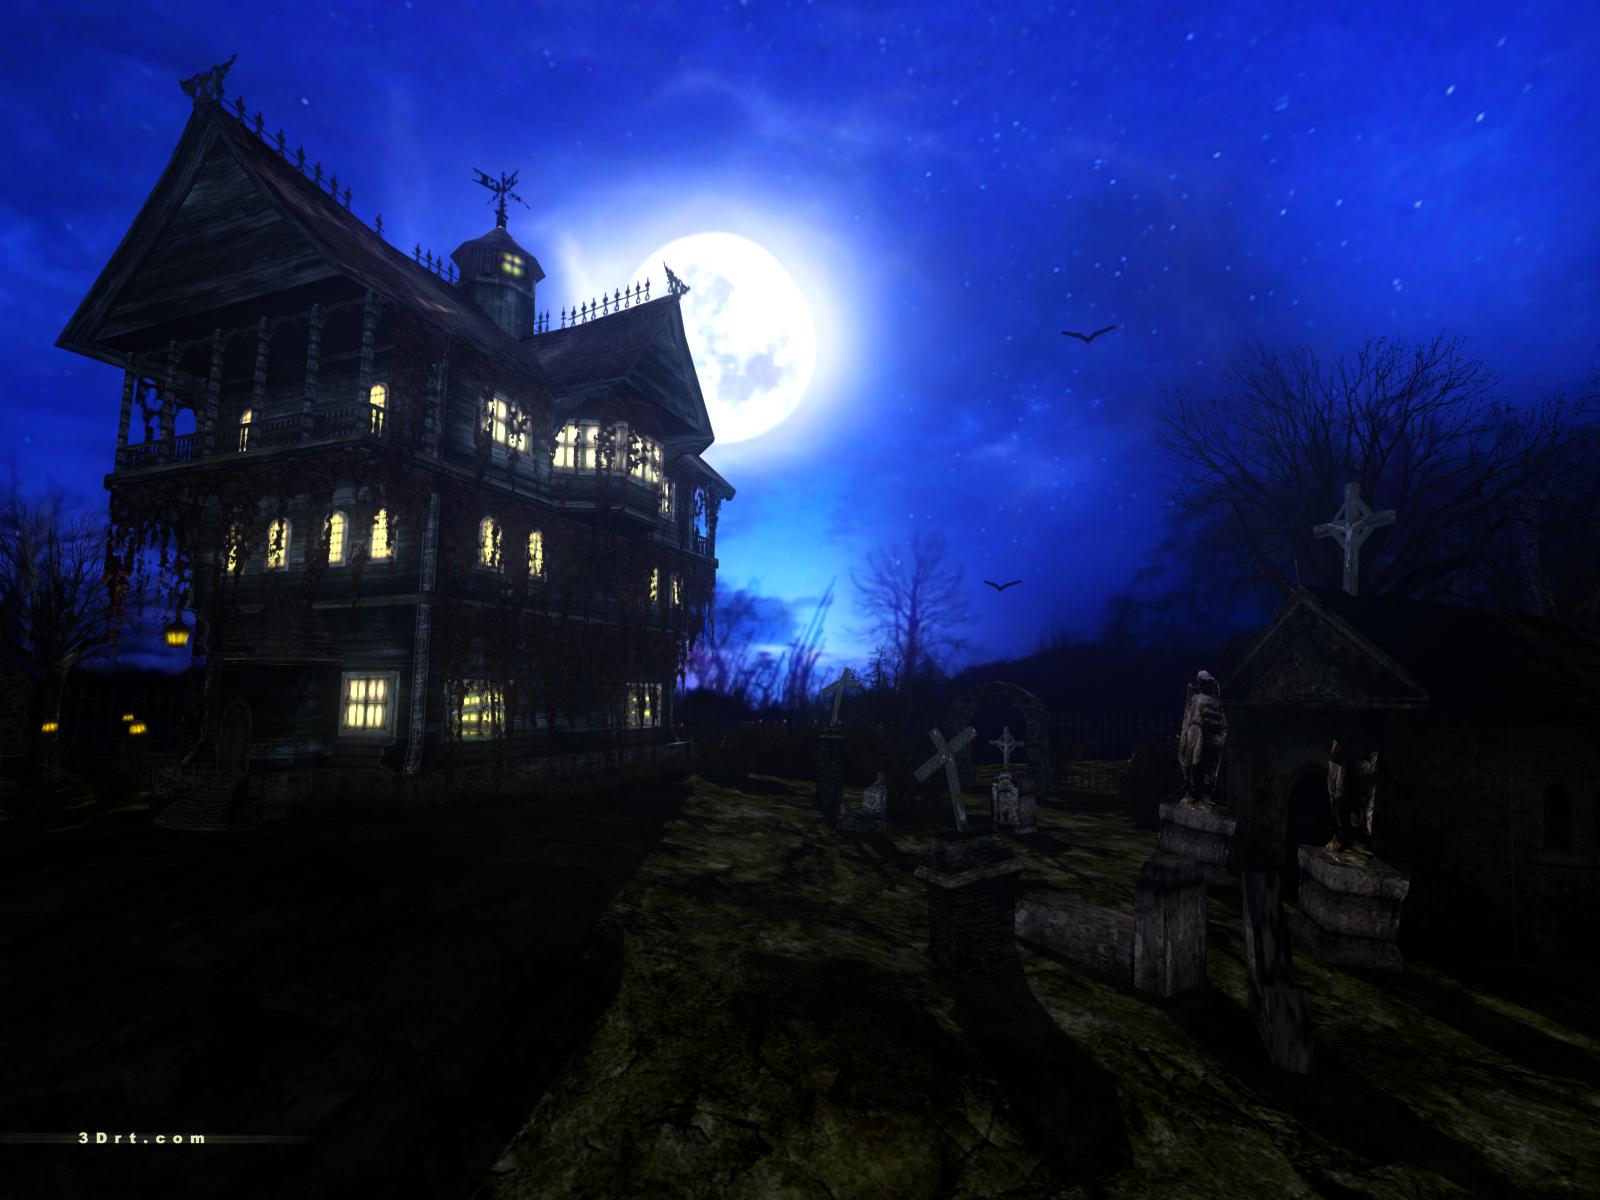 Halloween Haunted House Quotes QuotesGram 1600x1200